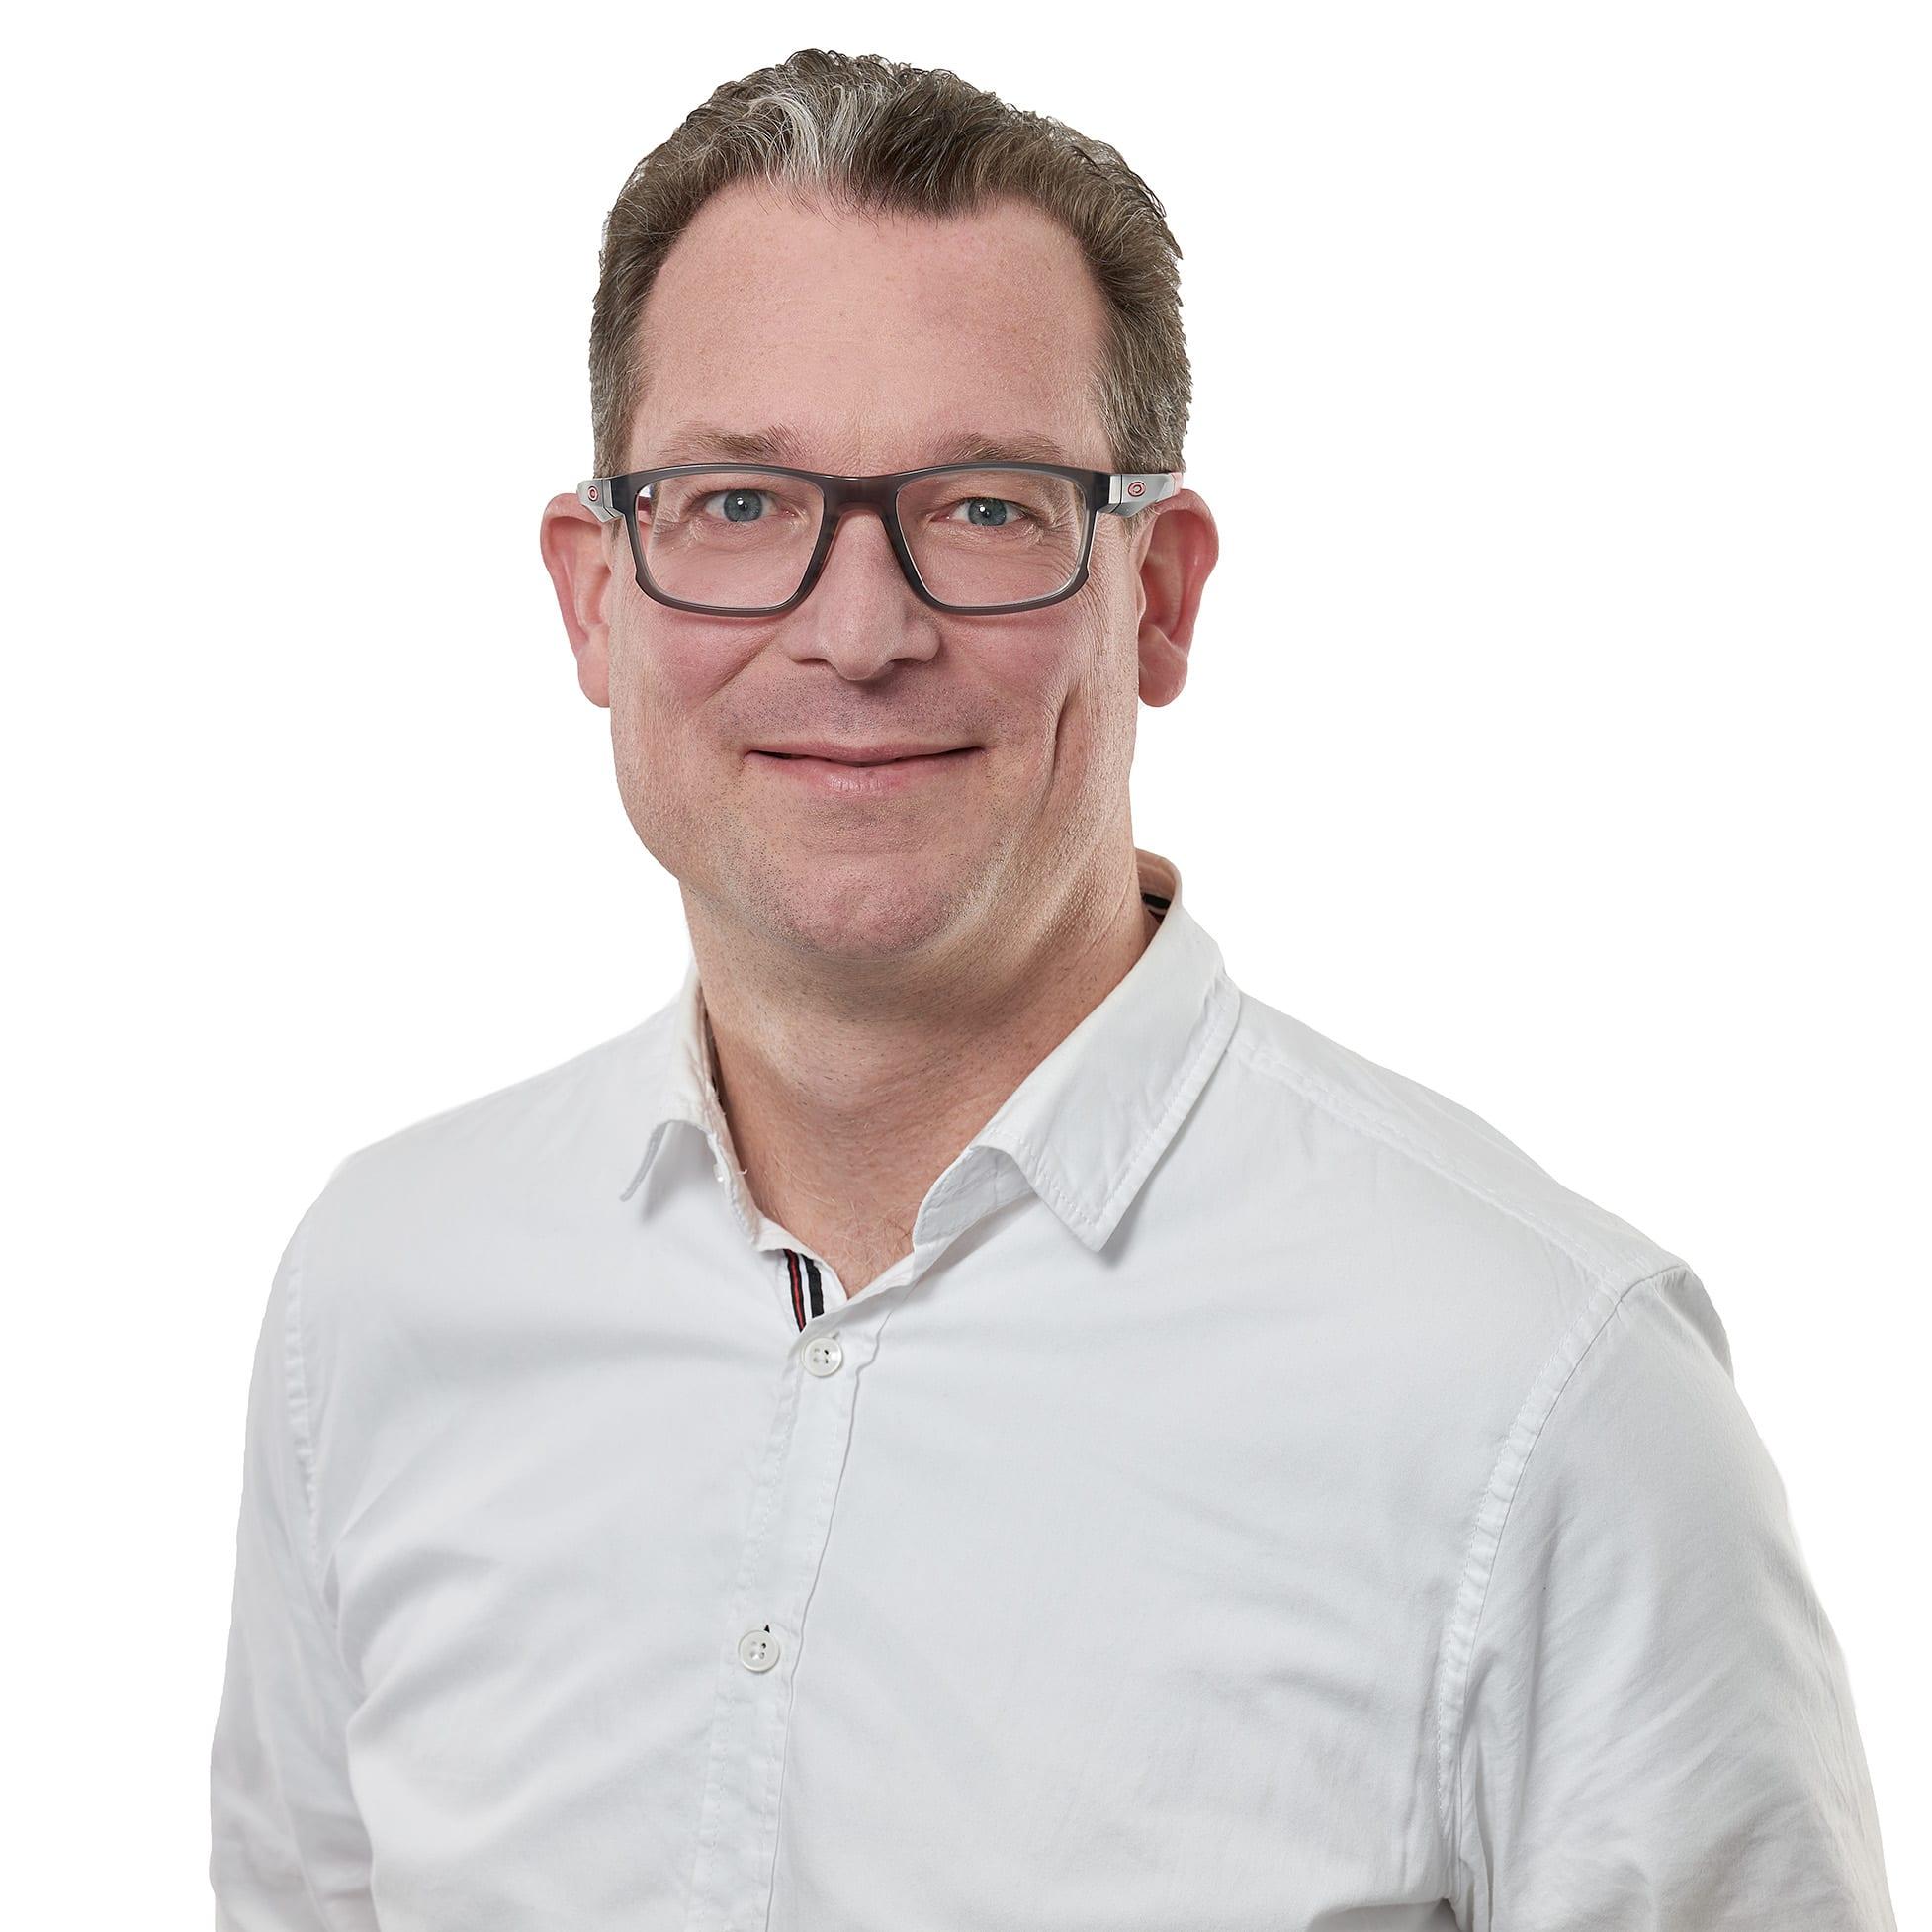 Jörg Aufderhaar